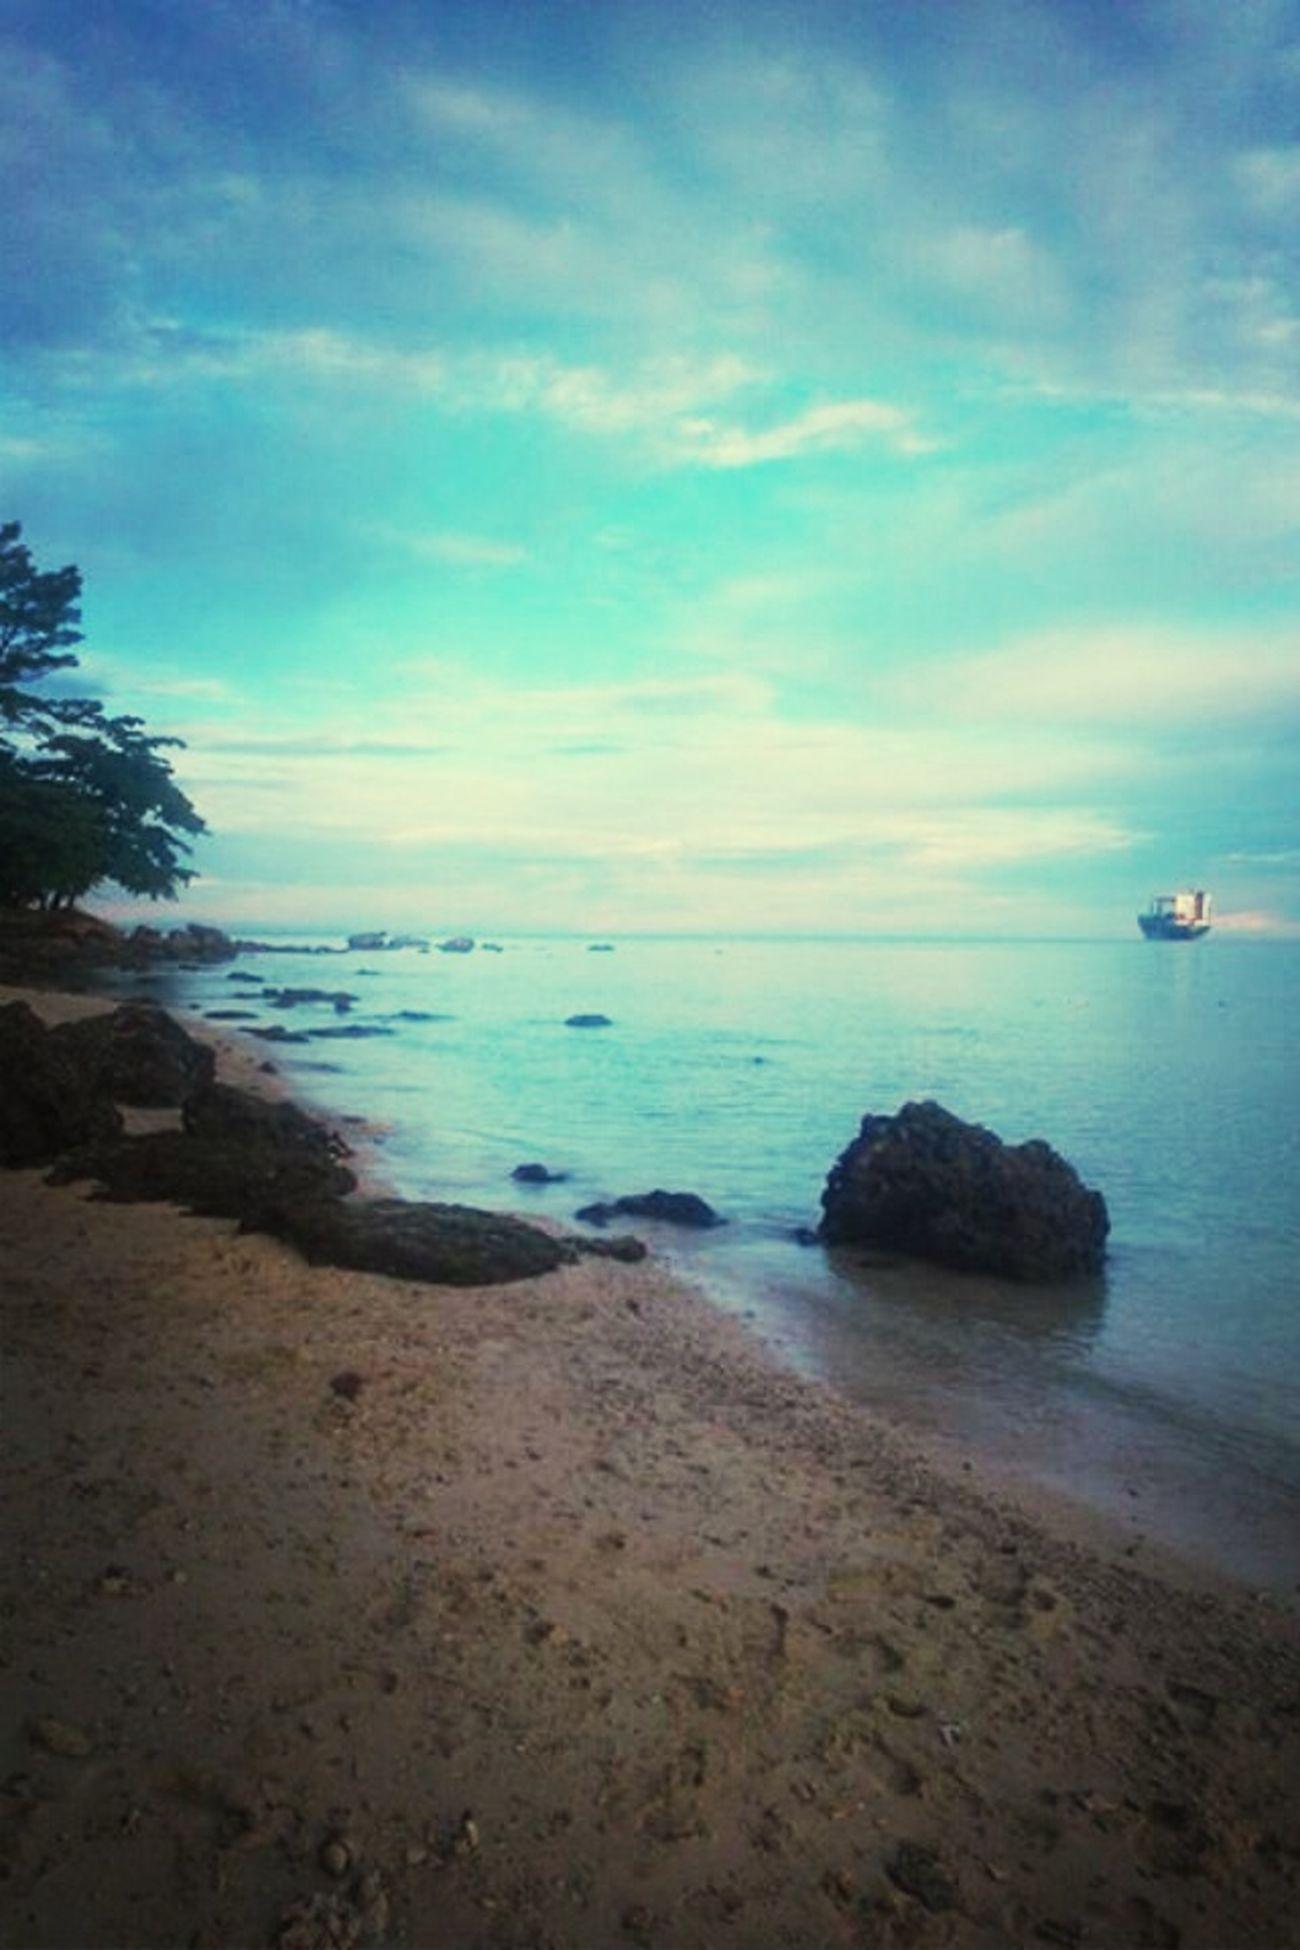 Pantaipasirputih Manokwari Papuabarat